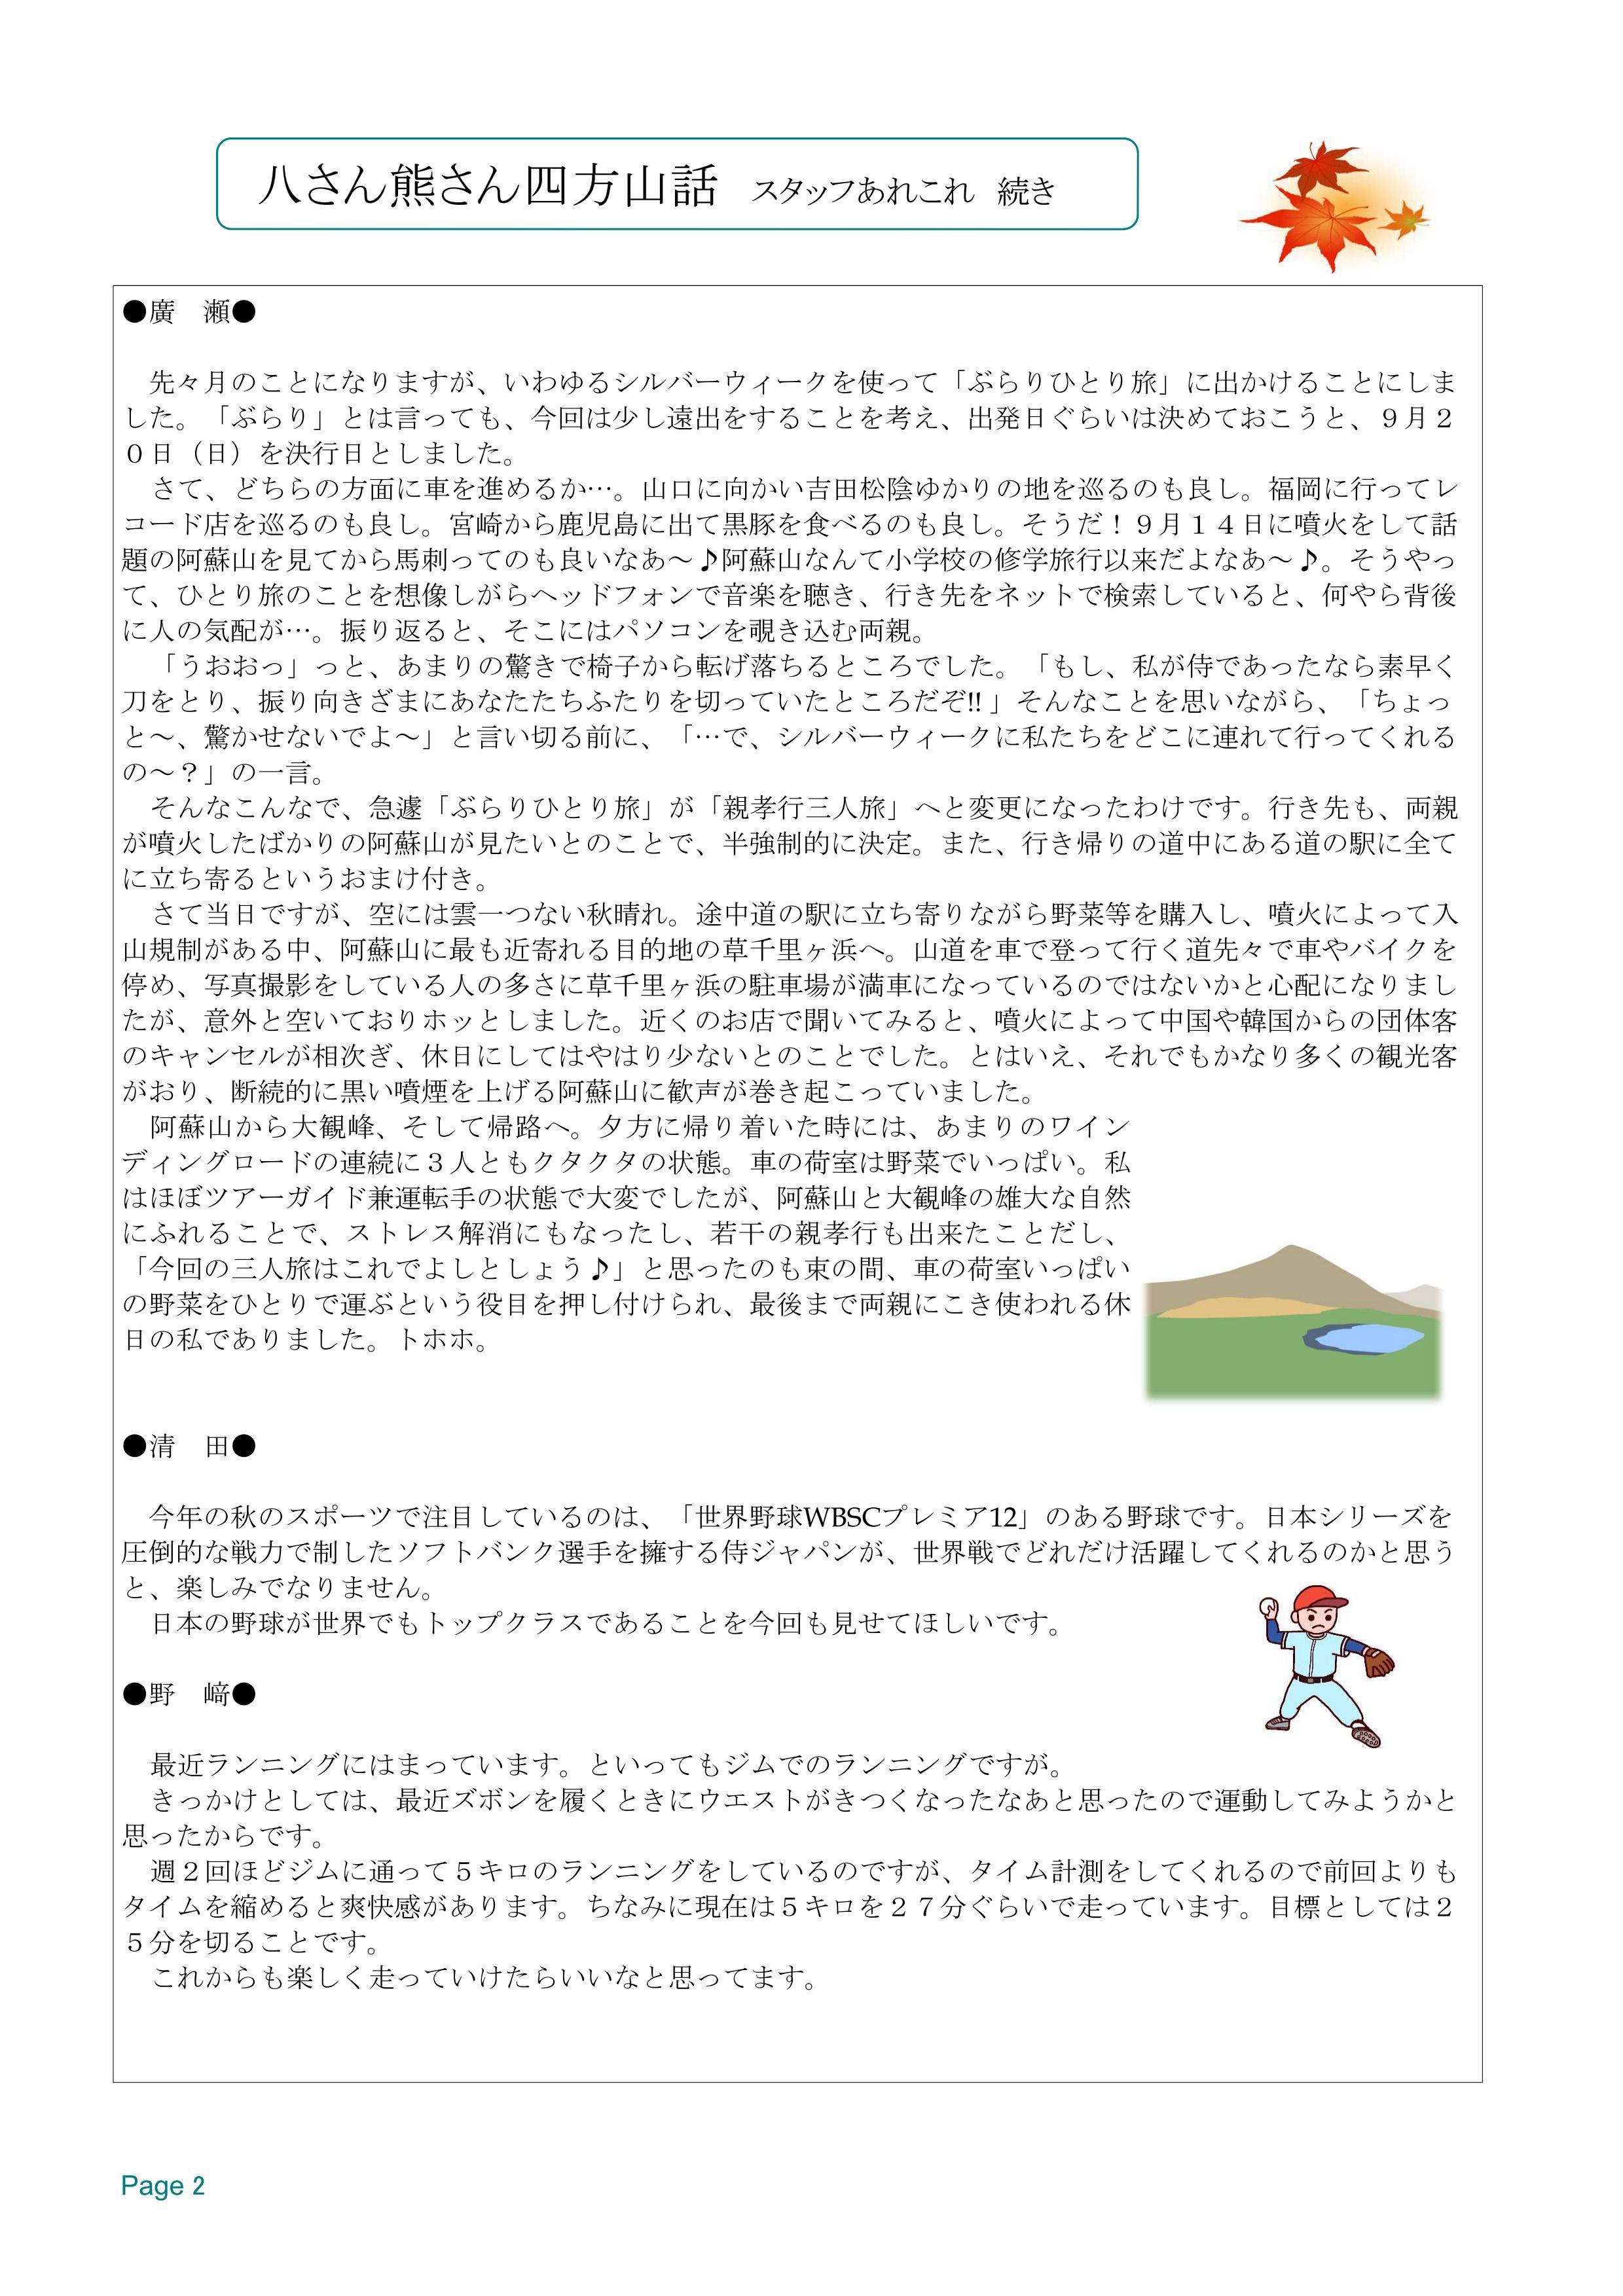 NLH27.11_02.jpg